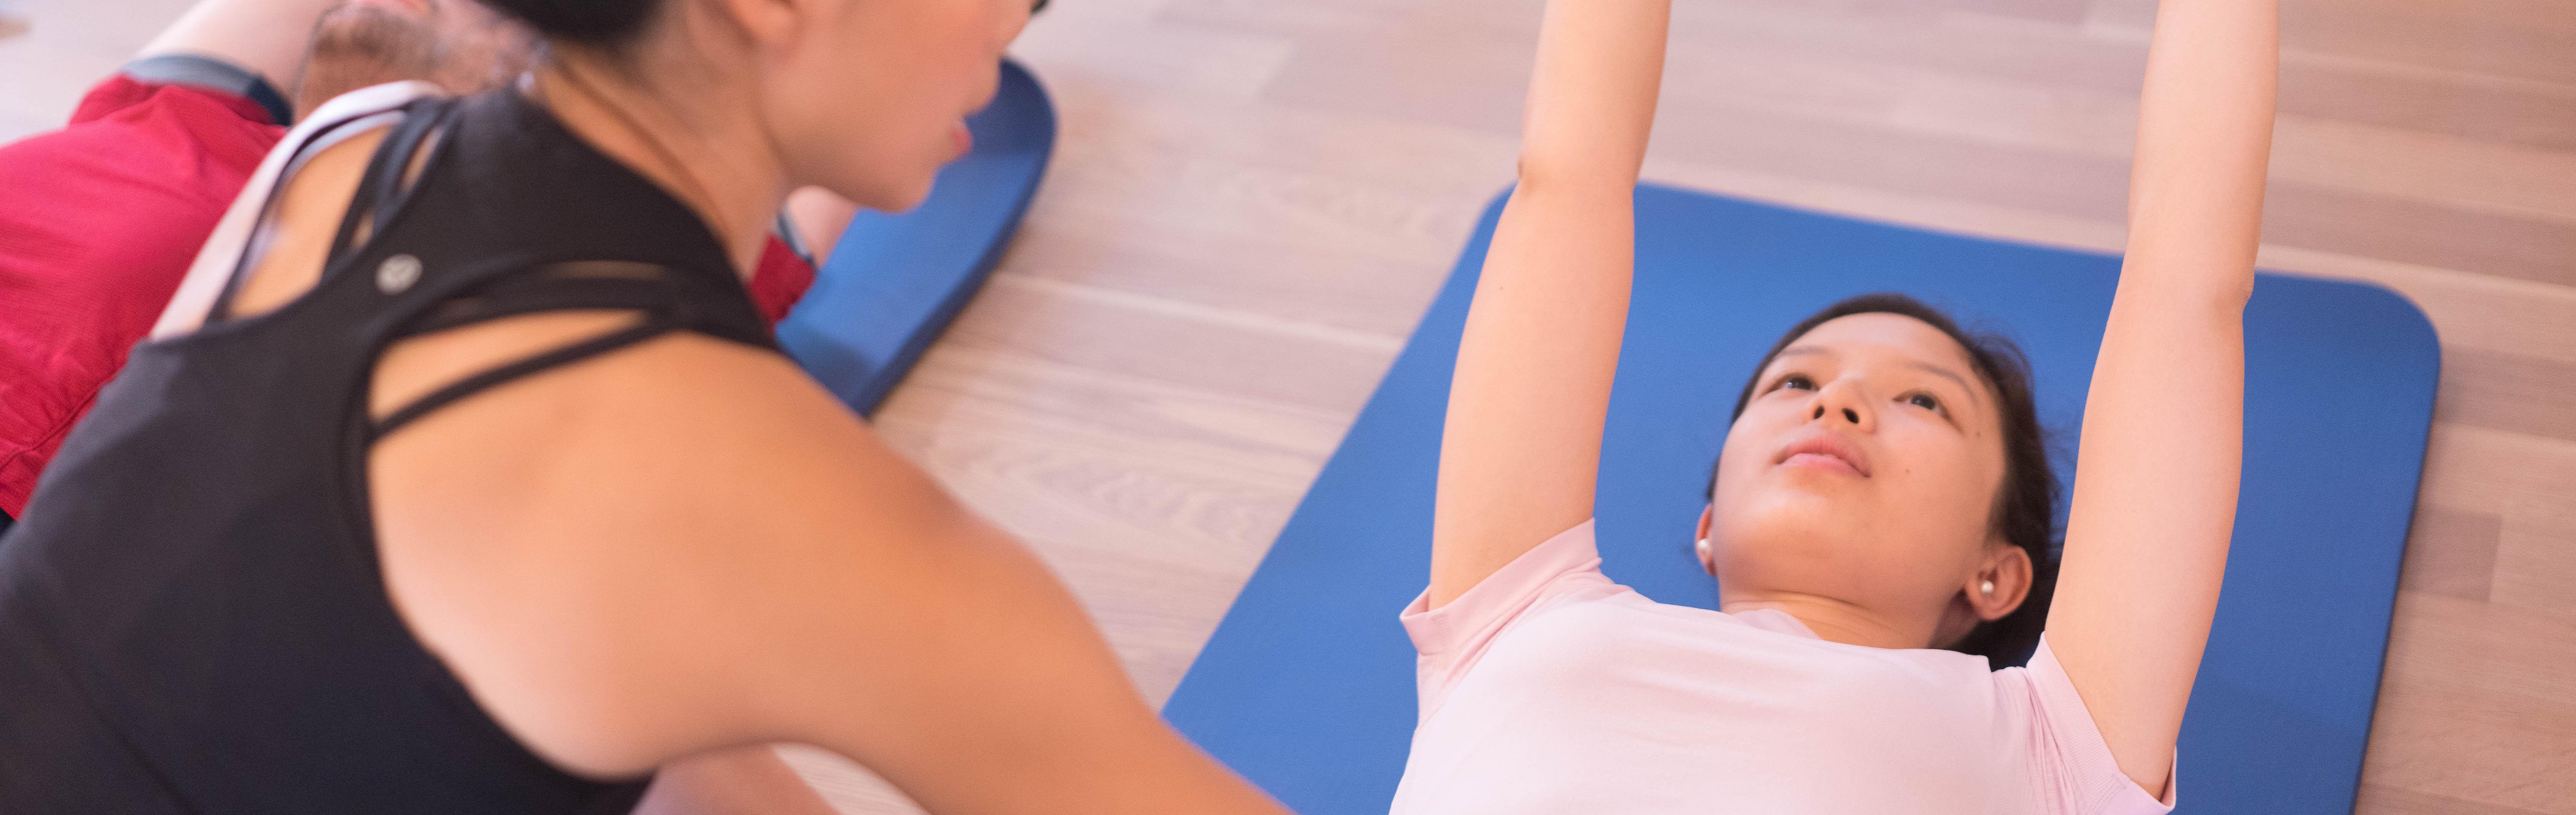 Pilates: Mind Over Matter (5 minutes read)